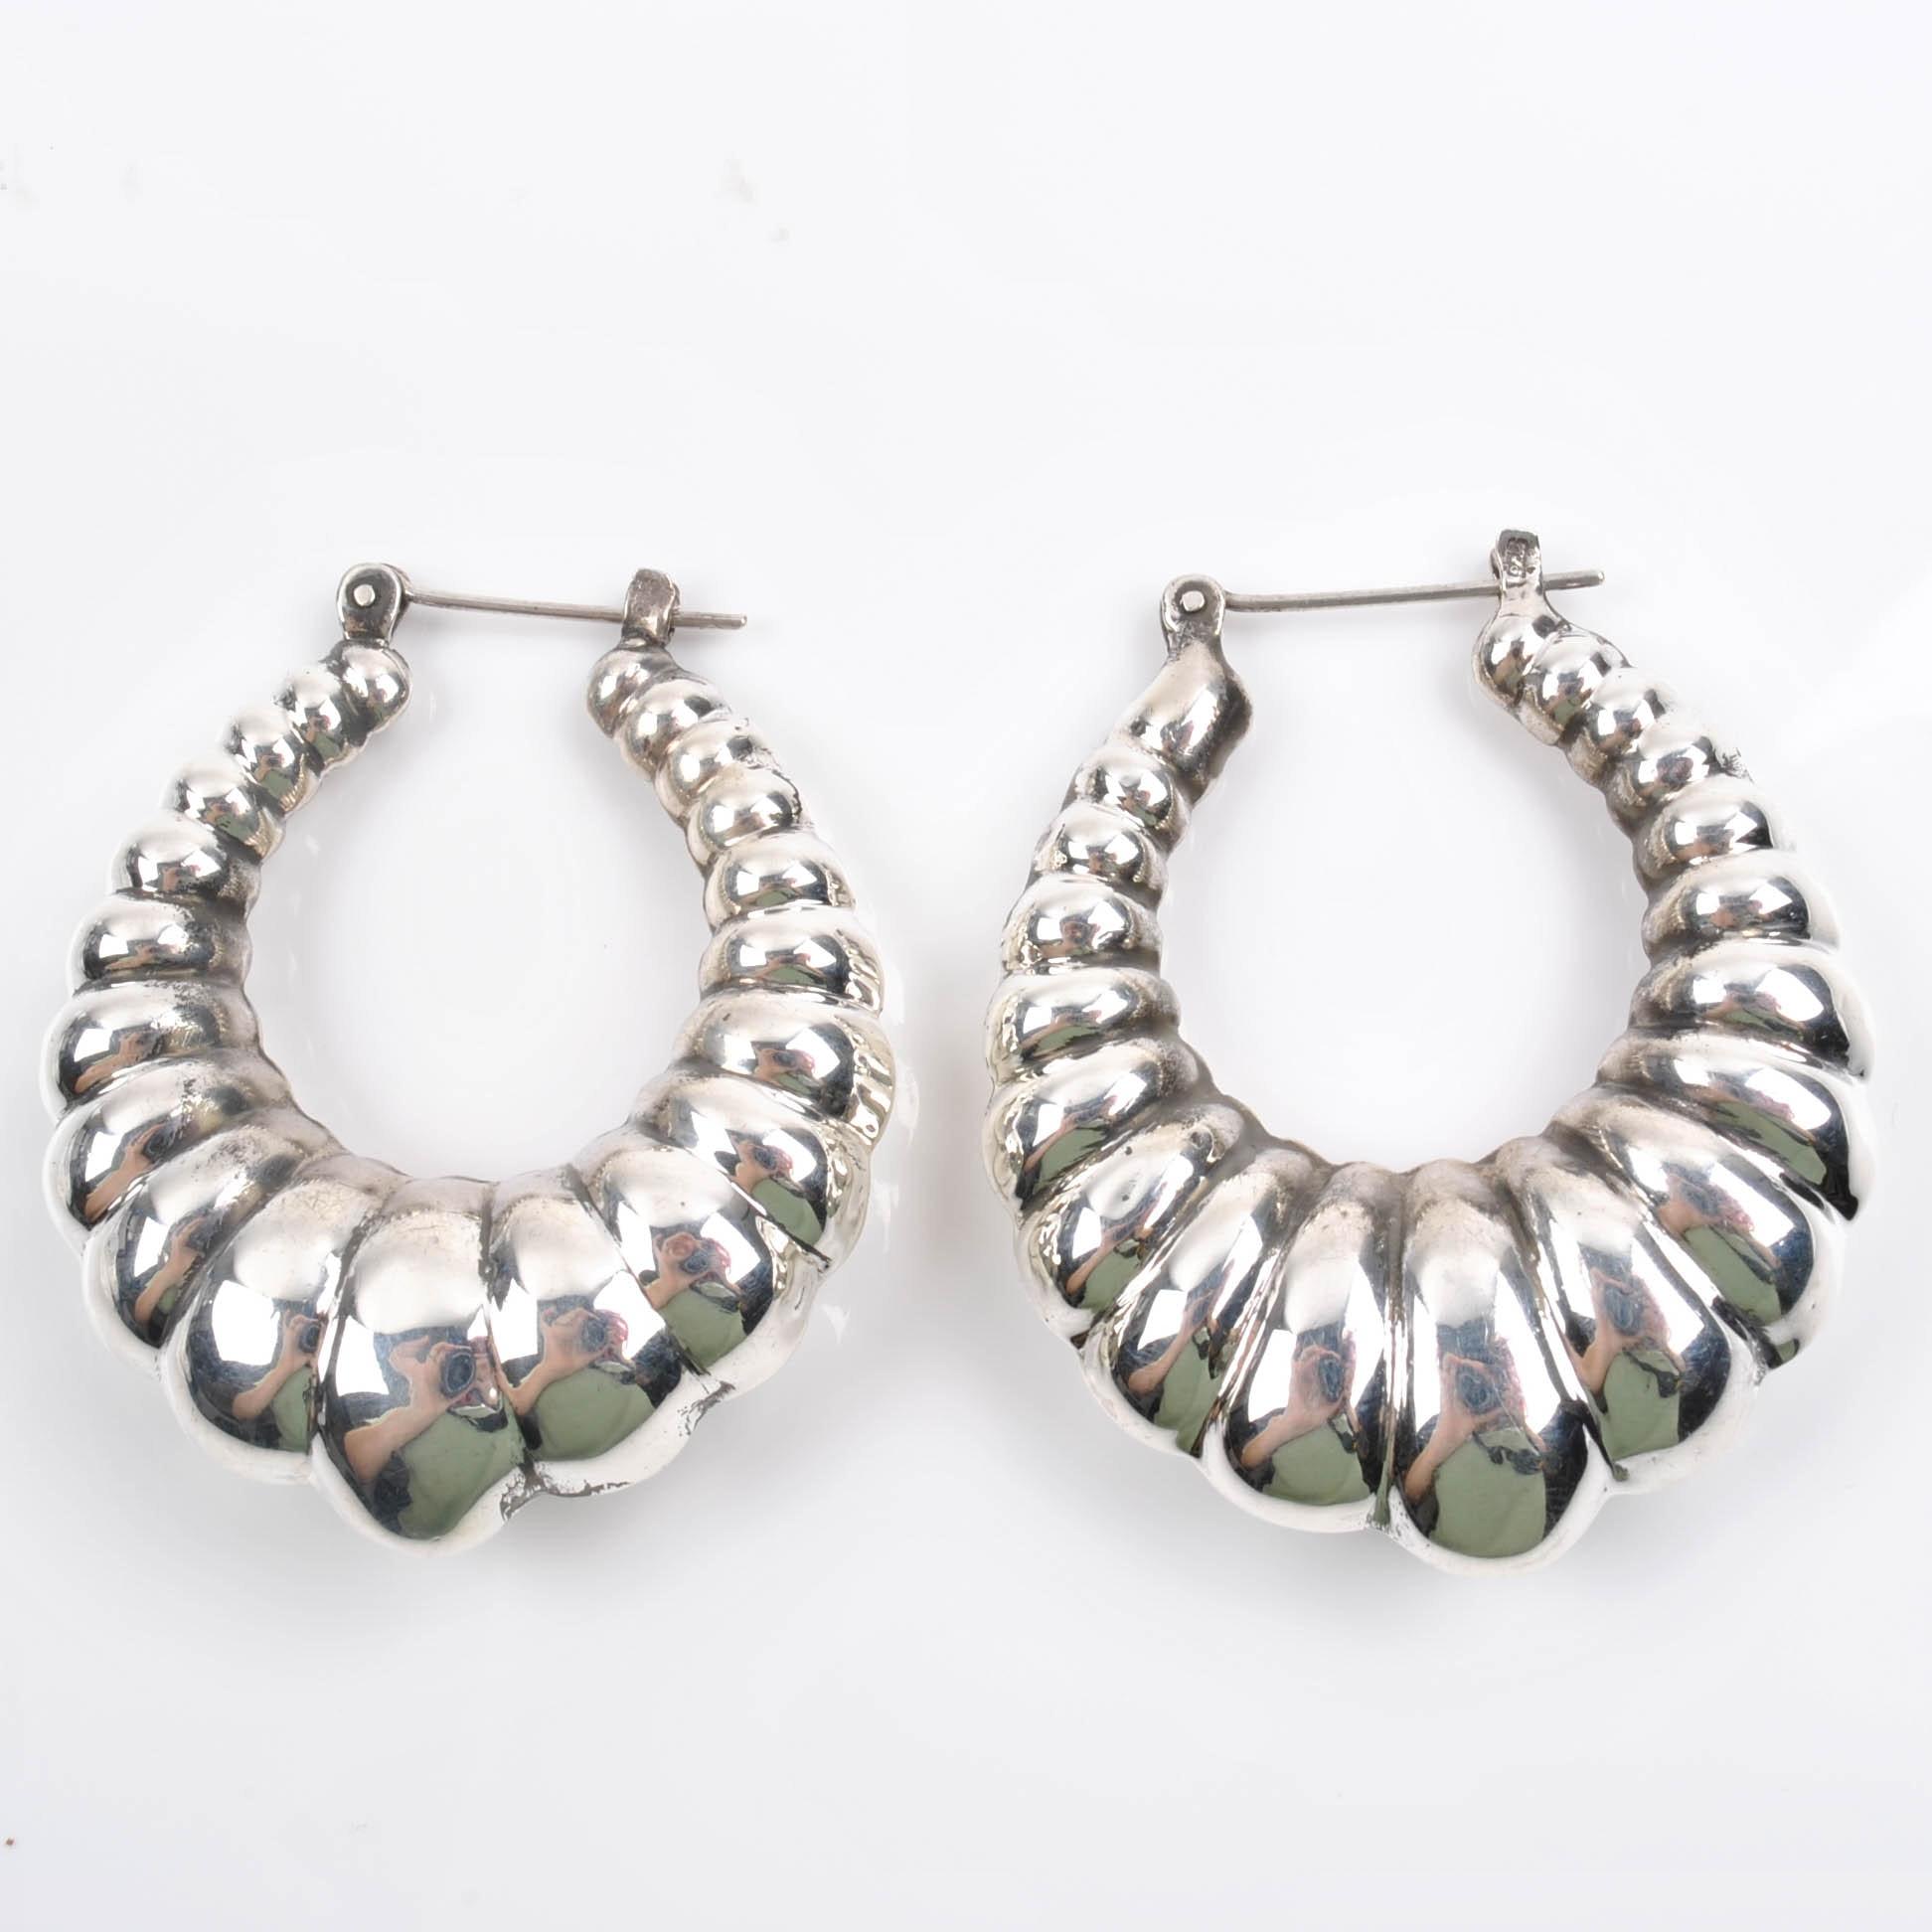 Sterling Silver Scalloped Hoop Earrings